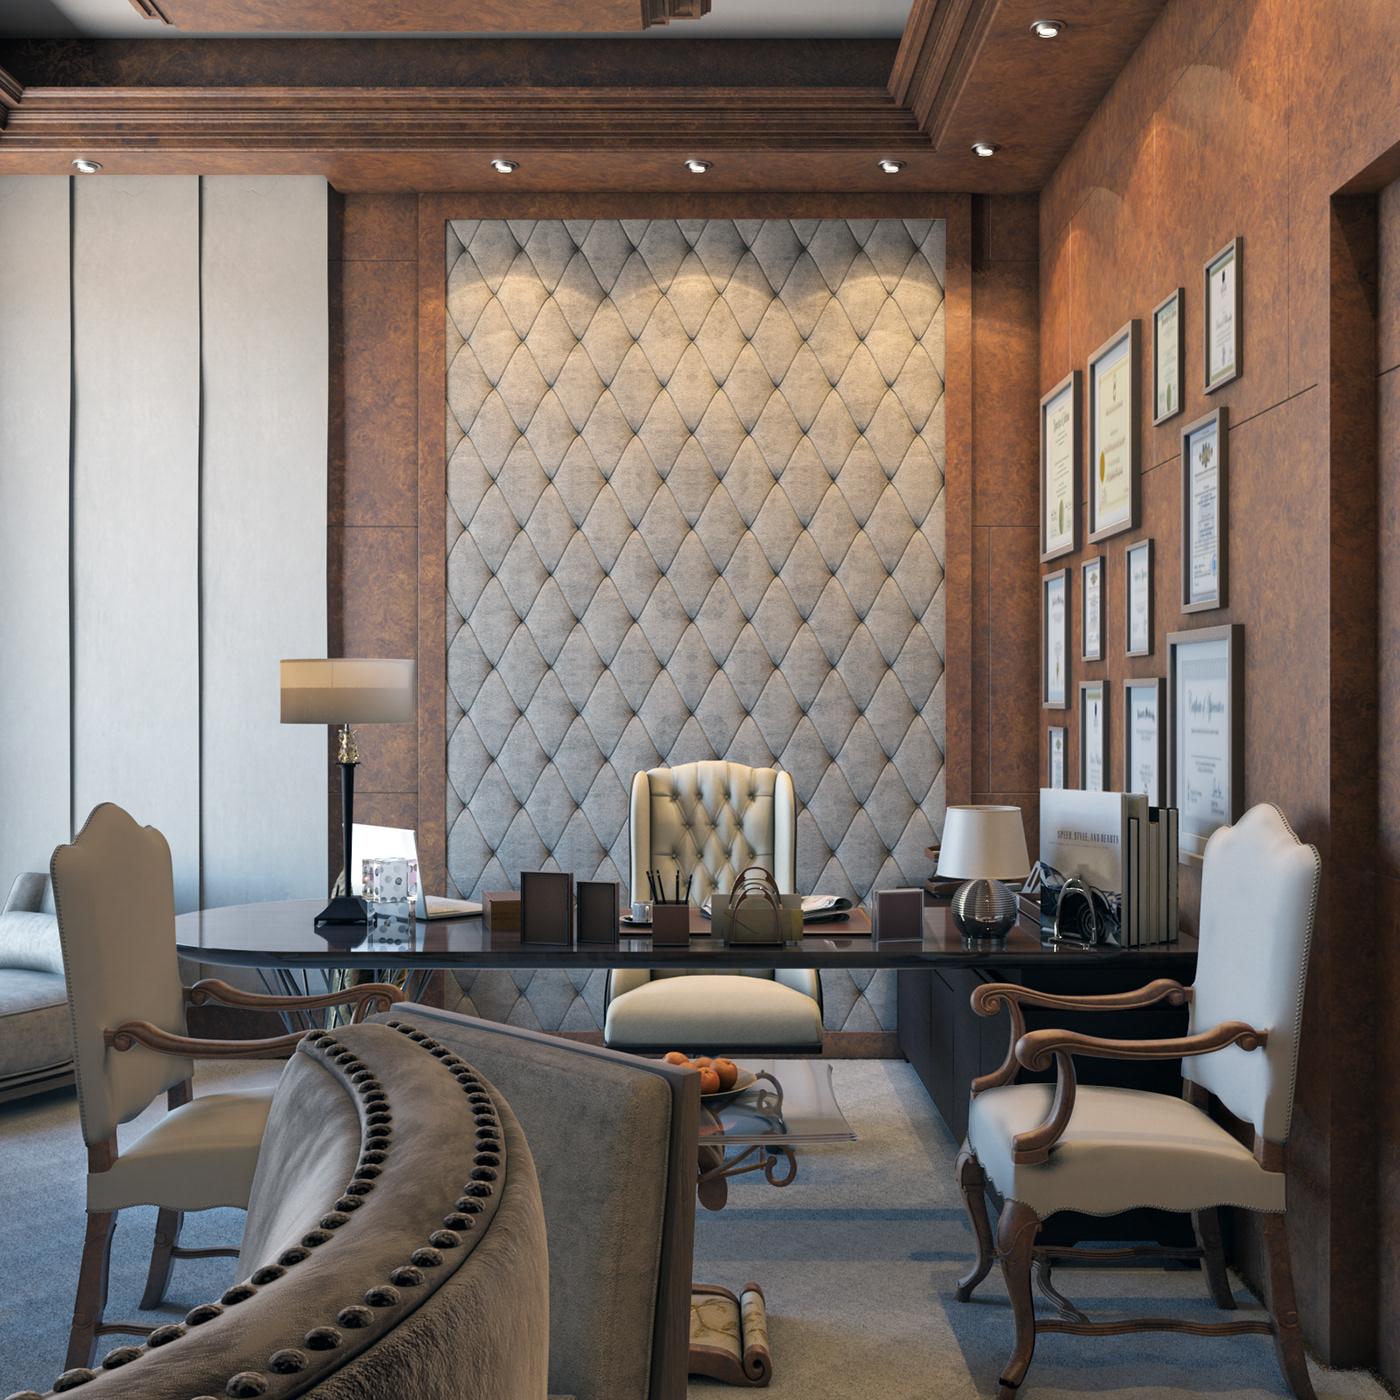 architecture interior design  design creative visualization Interior 3dsmax vray graphics Motaz mostafa